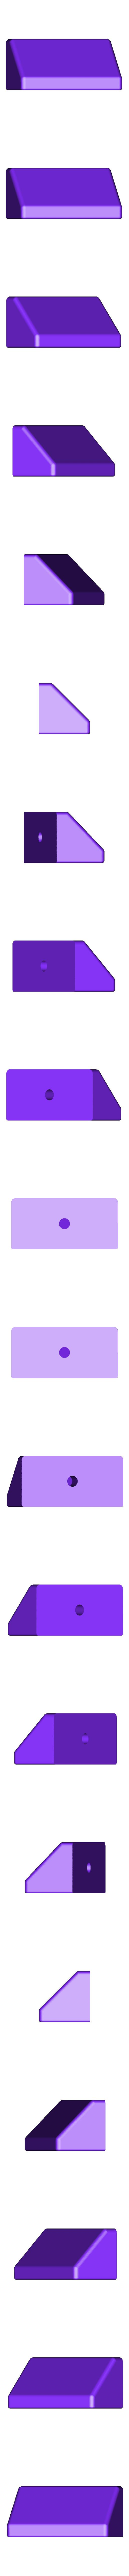 Small Drawer Knob.STL Download STL file Ender 3 Pro Storage Mod Kit • Object to 3D print, a3rdDimension